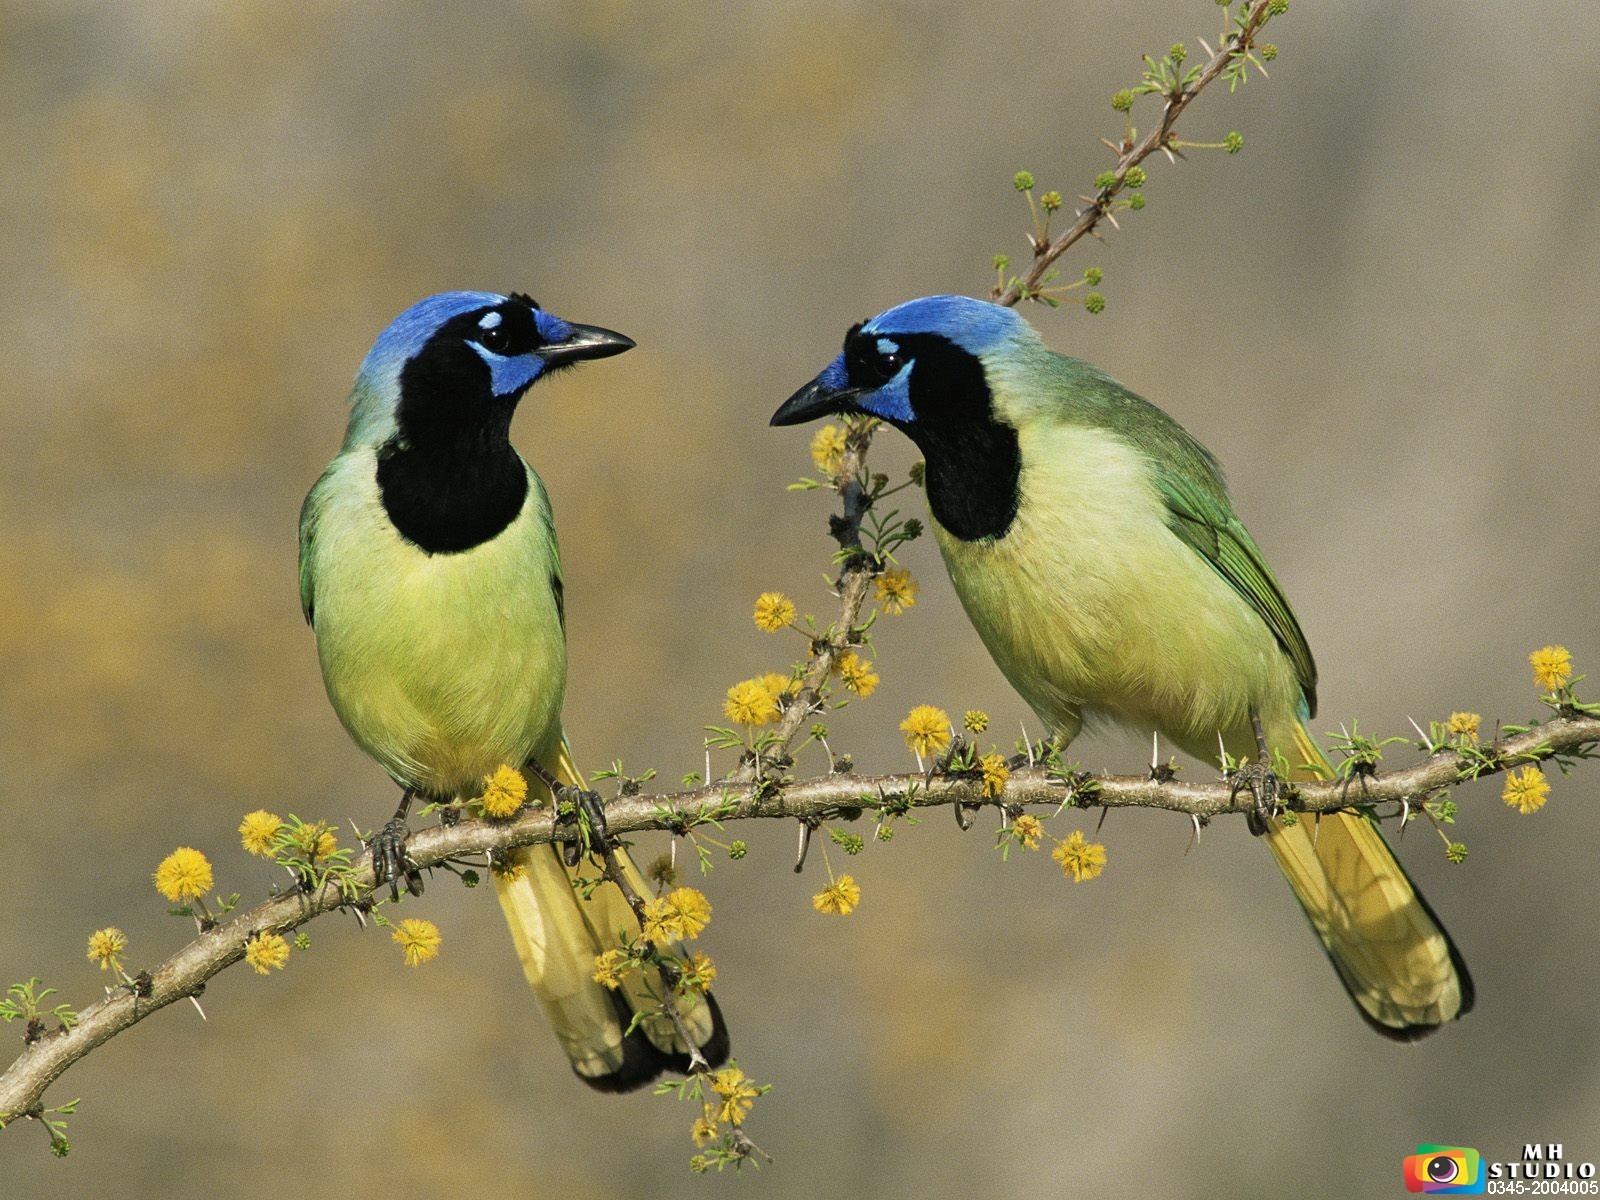 http://4.bp.blogspot.com/-uzwS_ThiJ5A/UKCuF3i9-JI/AAAAAAAABE8/WhpQIN-5zYY/s1600/beautiful+birds+hd+wallpaper+pakistan+mh+studio+tehsil+bazar+fort+abbas+mubashir+hassan+ch+03452004005+0632510005++(44).jpg